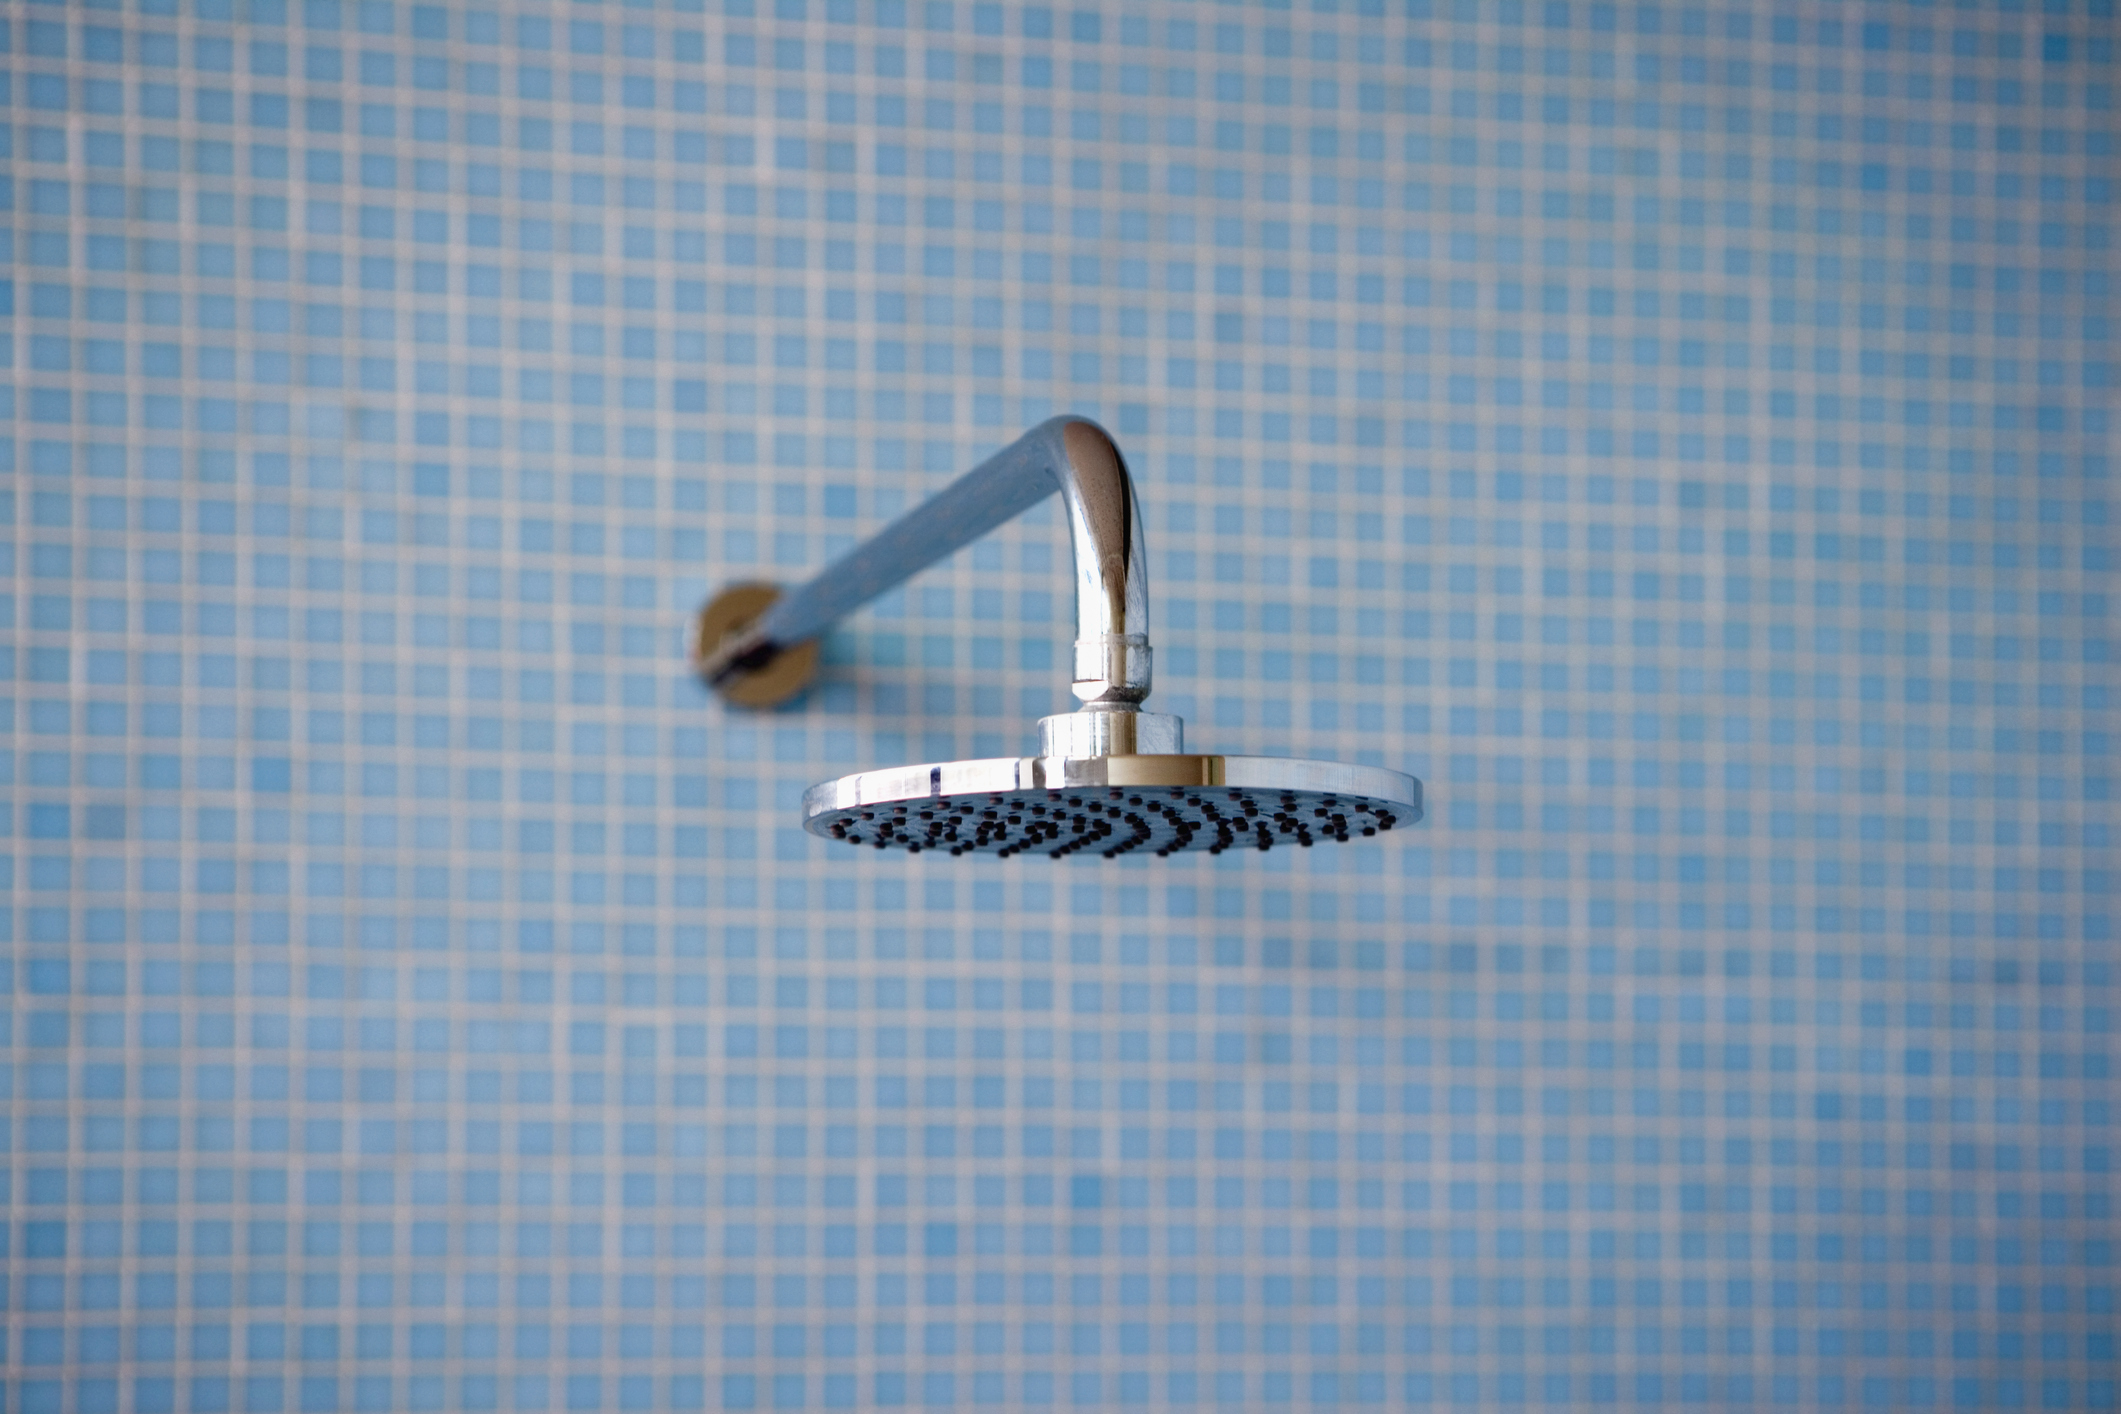 Rain Shower Head Installation